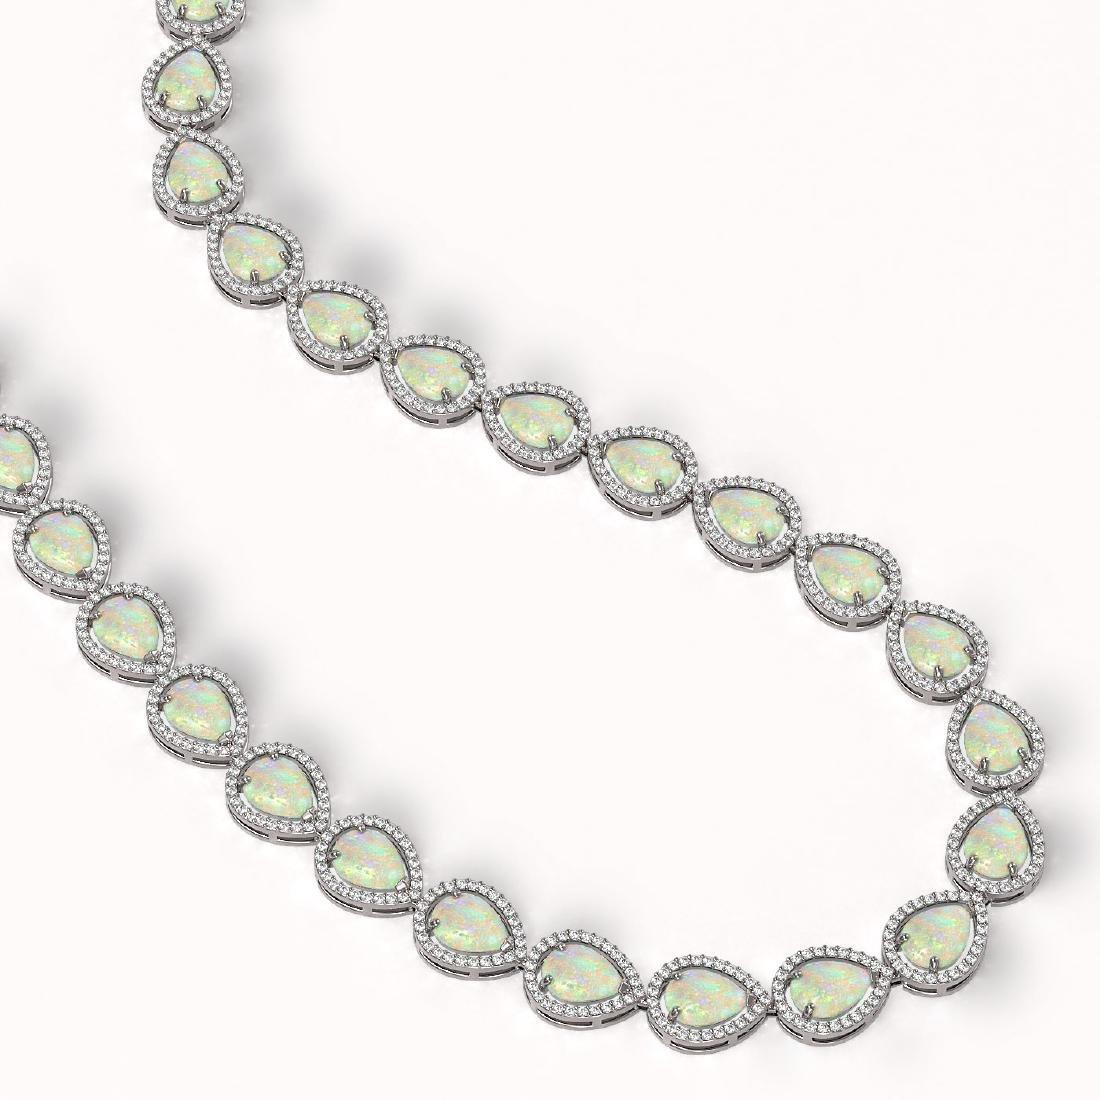 36.48 CTW Opal & Diamond Halo Necklace 10K White Gold - 2